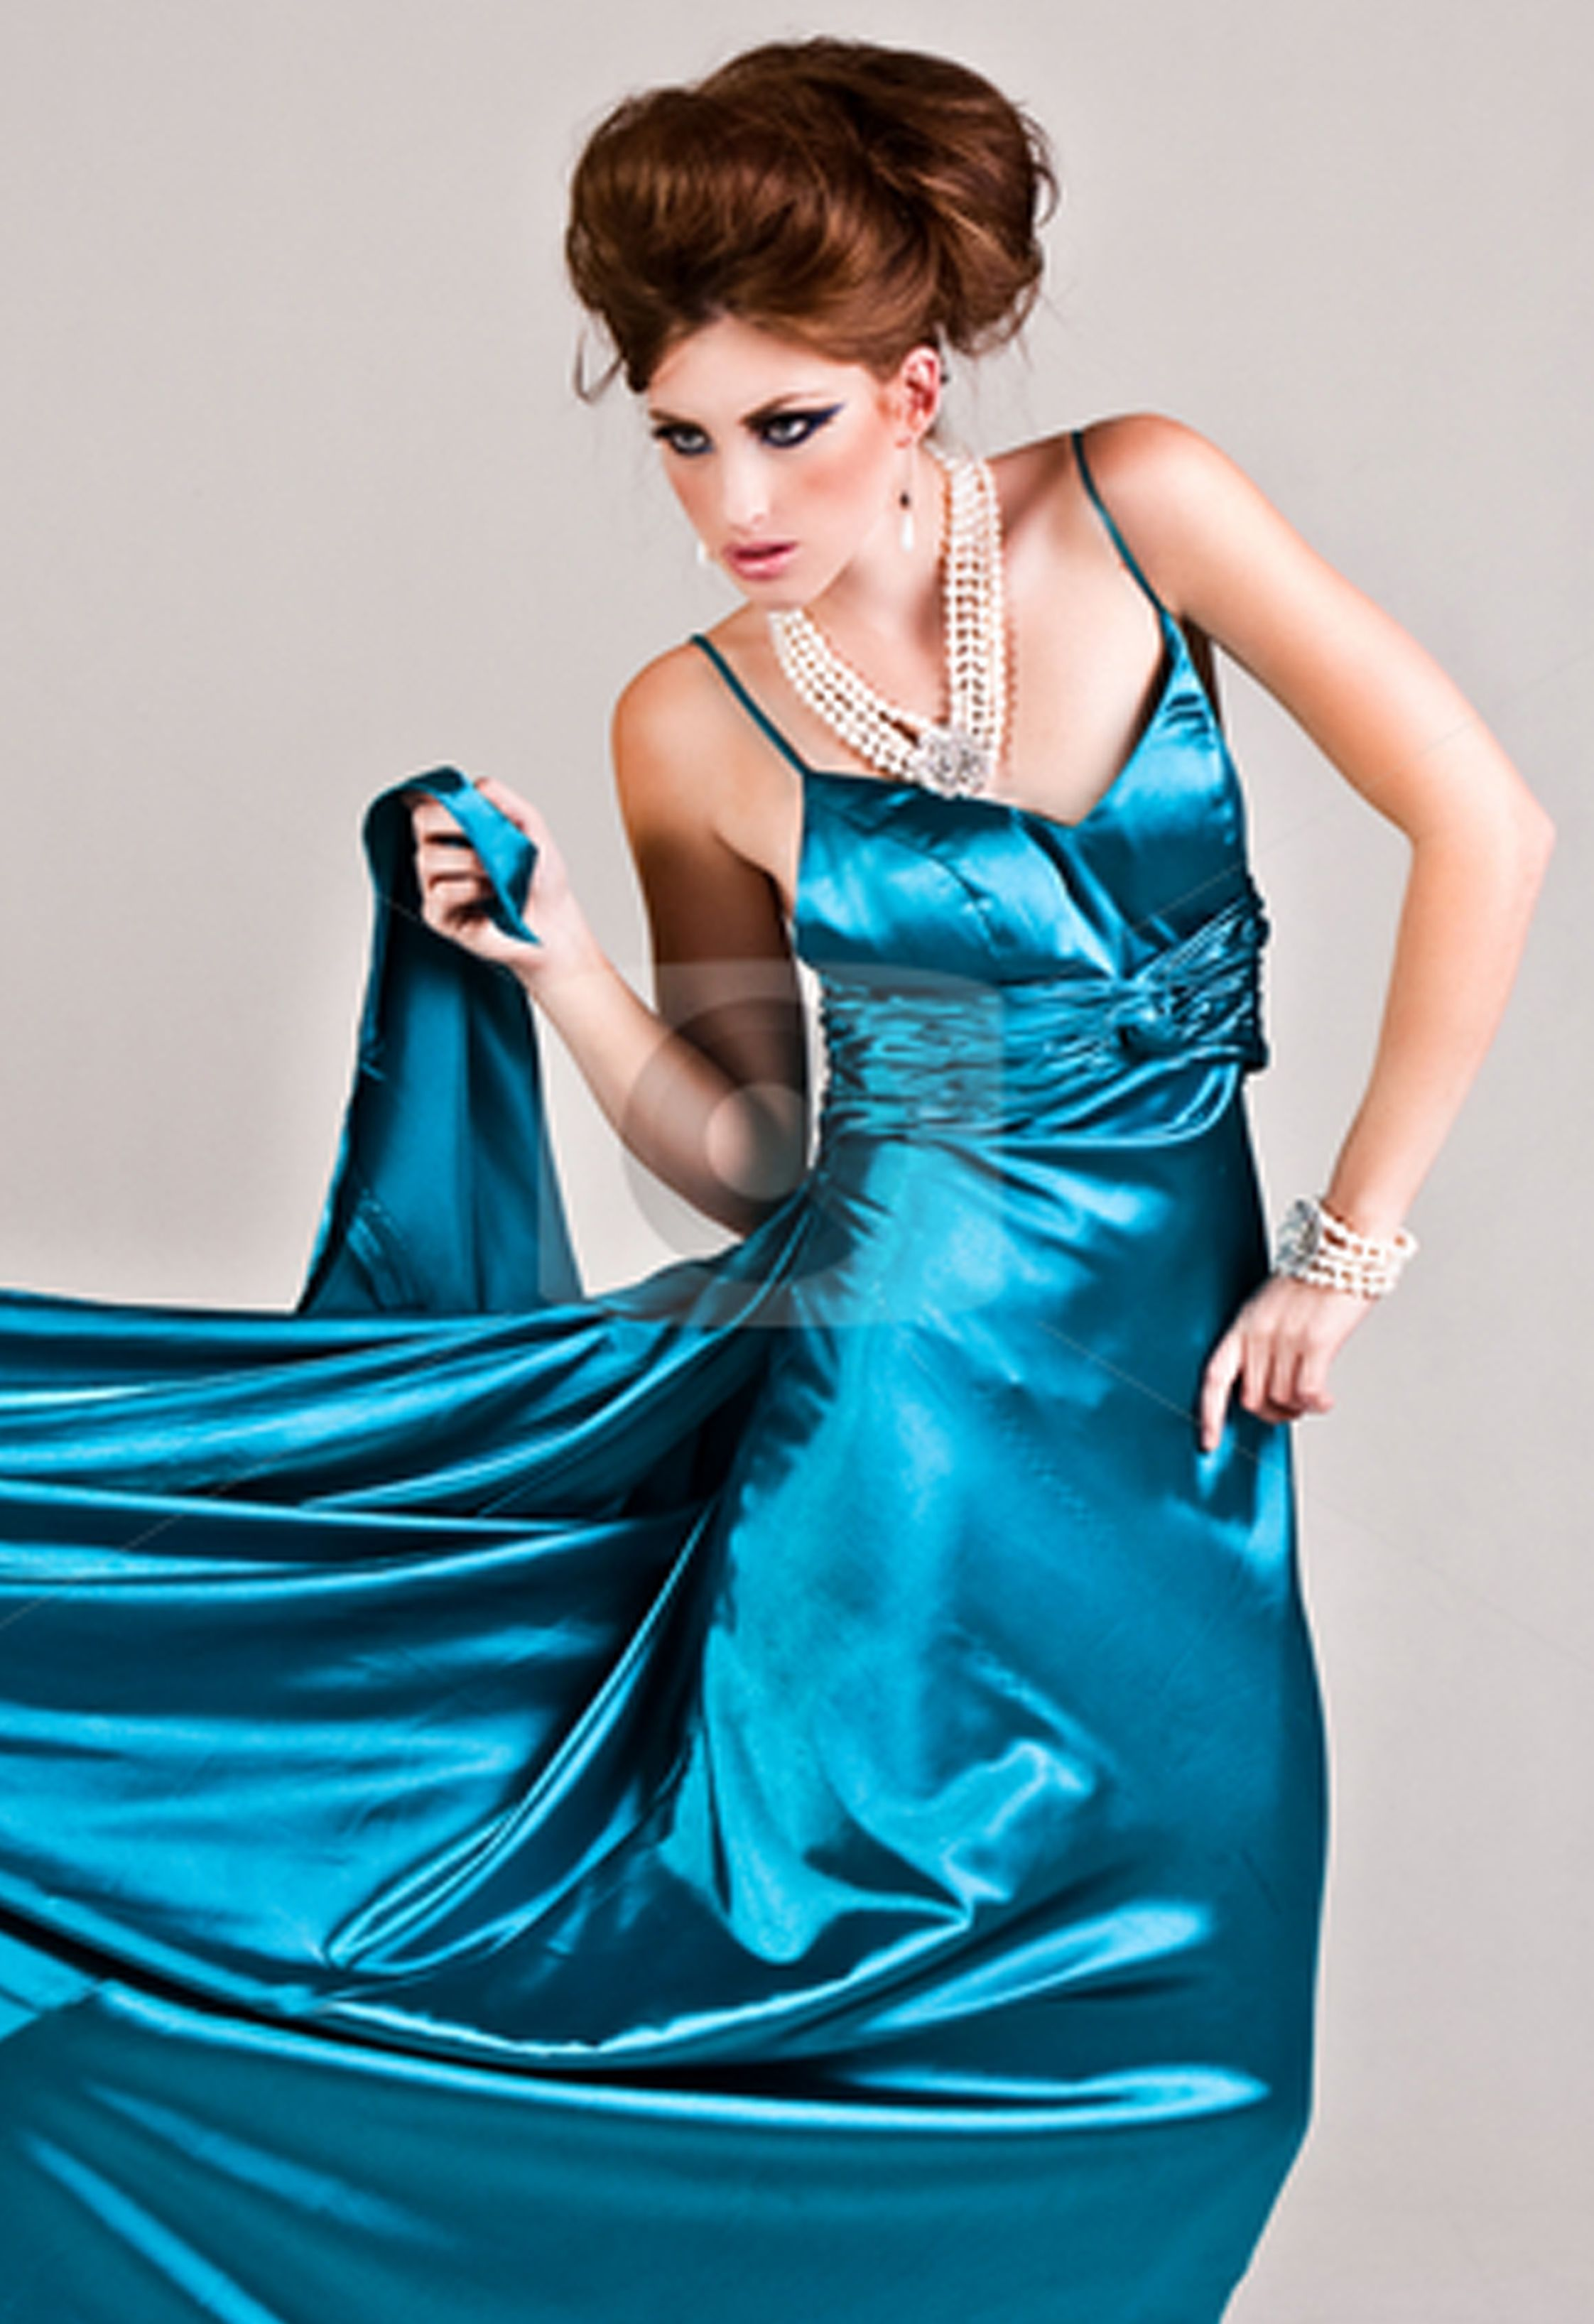 Pin by Bjarne Aarslev Jensen on Satin Party Dress 2 | Pinterest ...